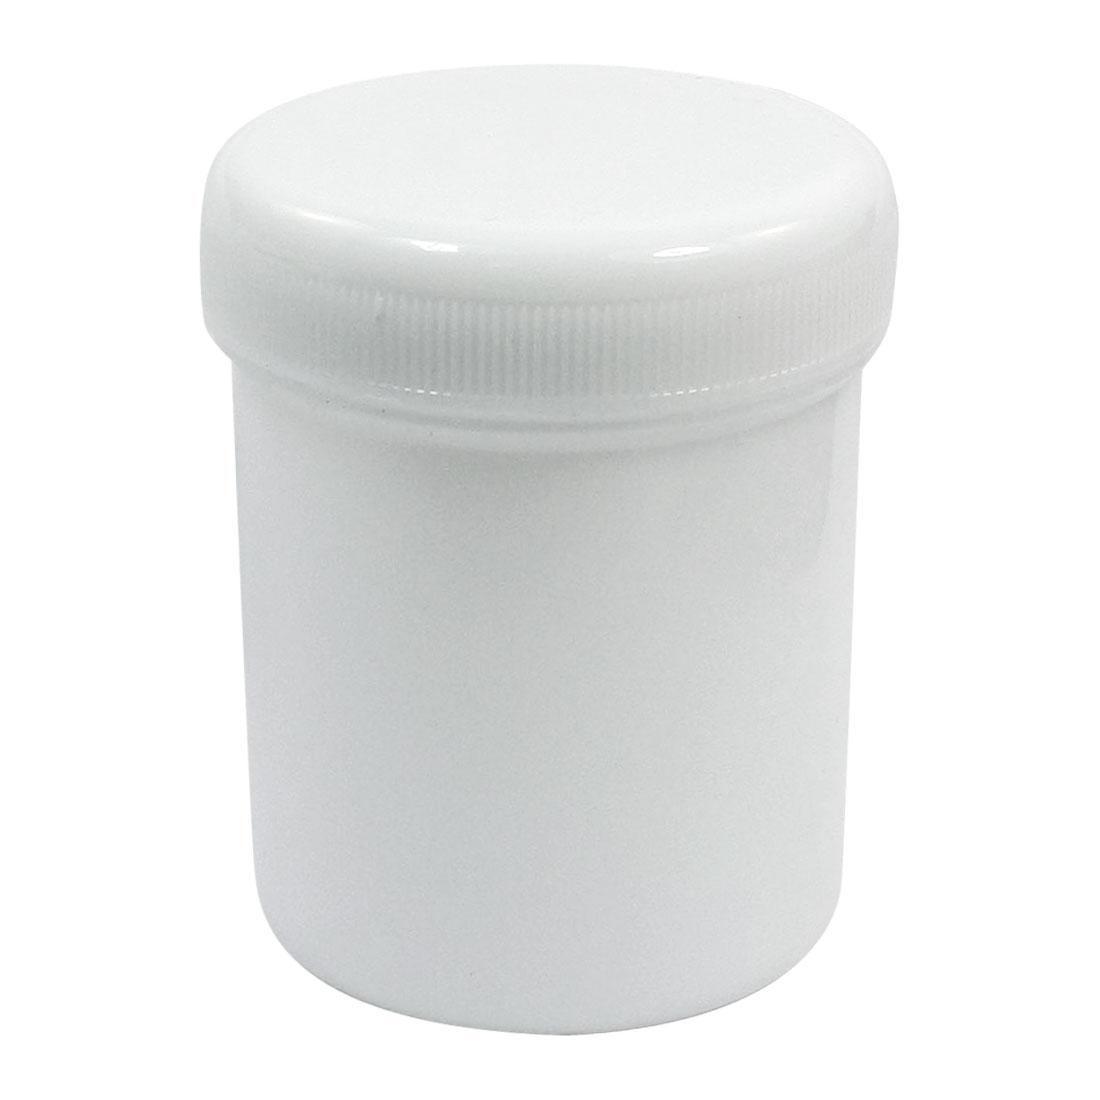 150mL Capacity 60mm Dia Mouth White Plastic Skidproof Cap Solder Paste Bottle